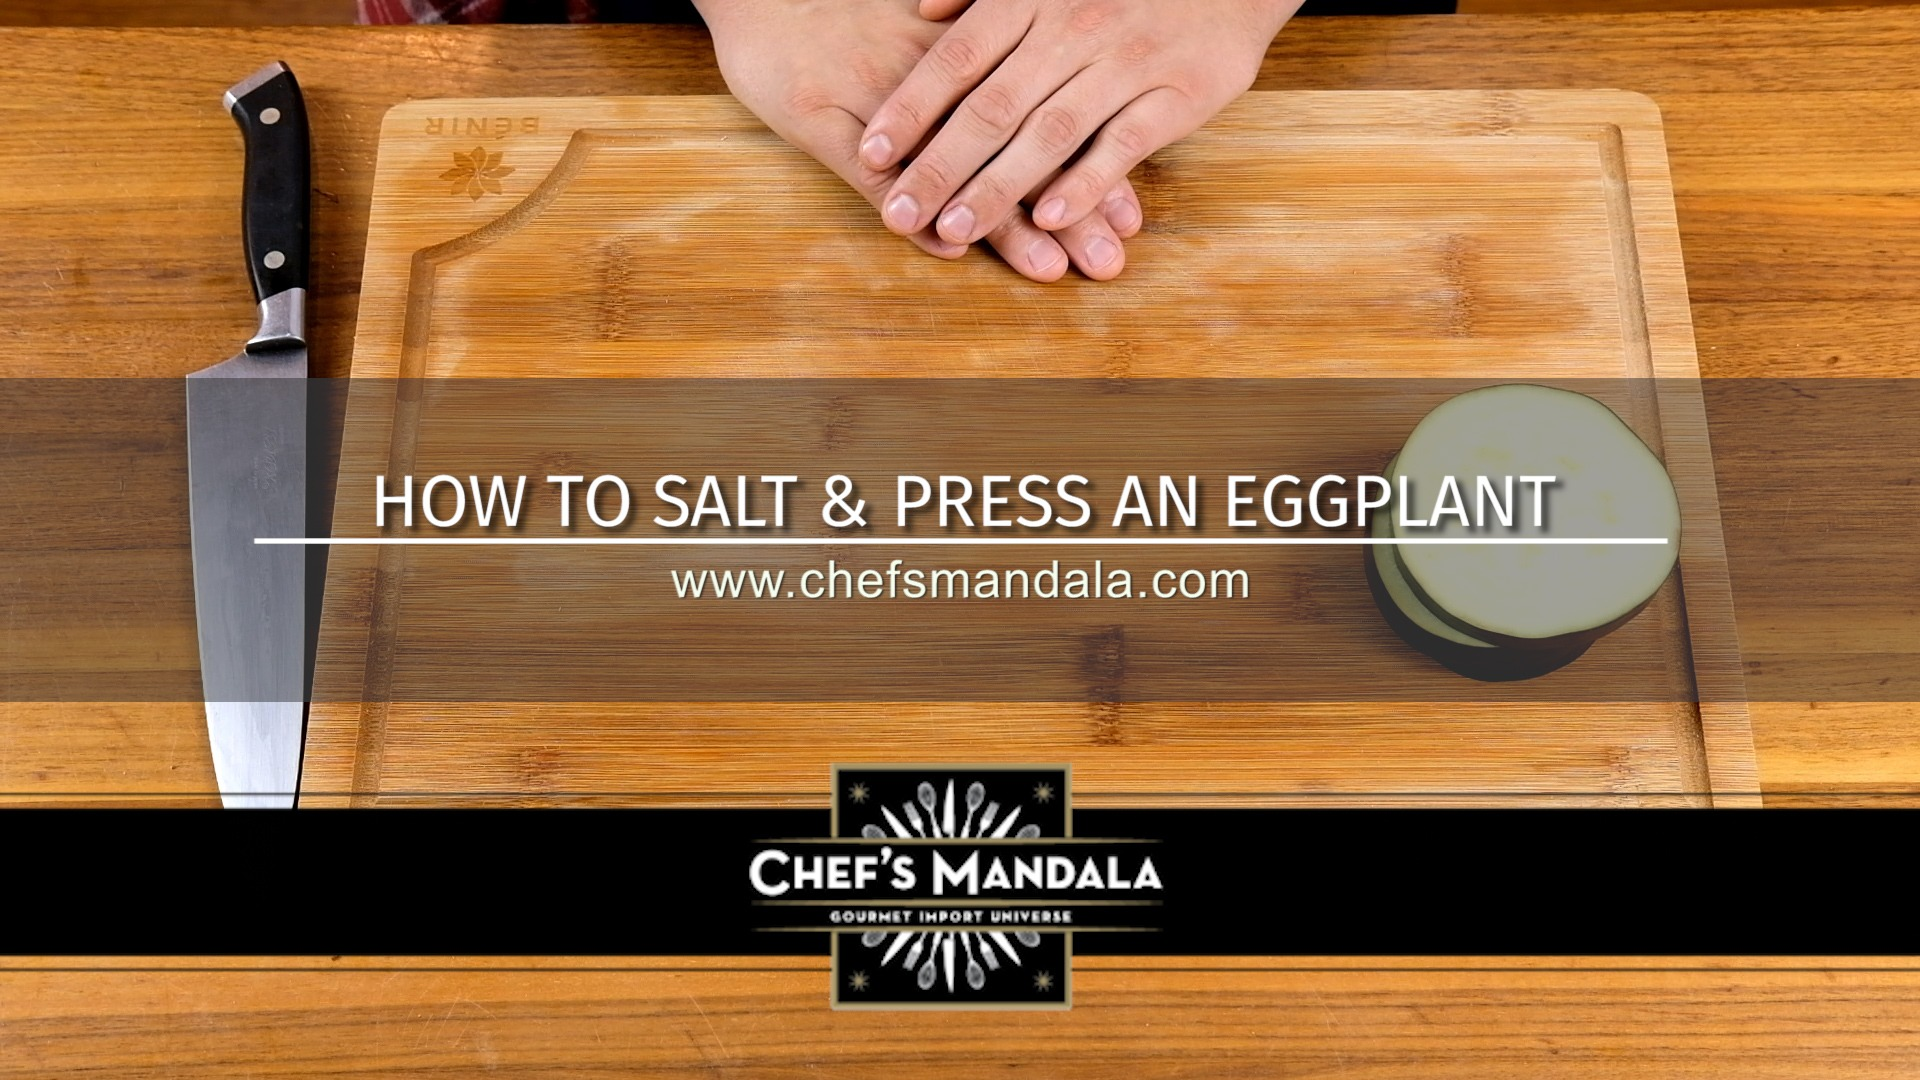 HOW TO SALT & PRESS AN EGGPLANT